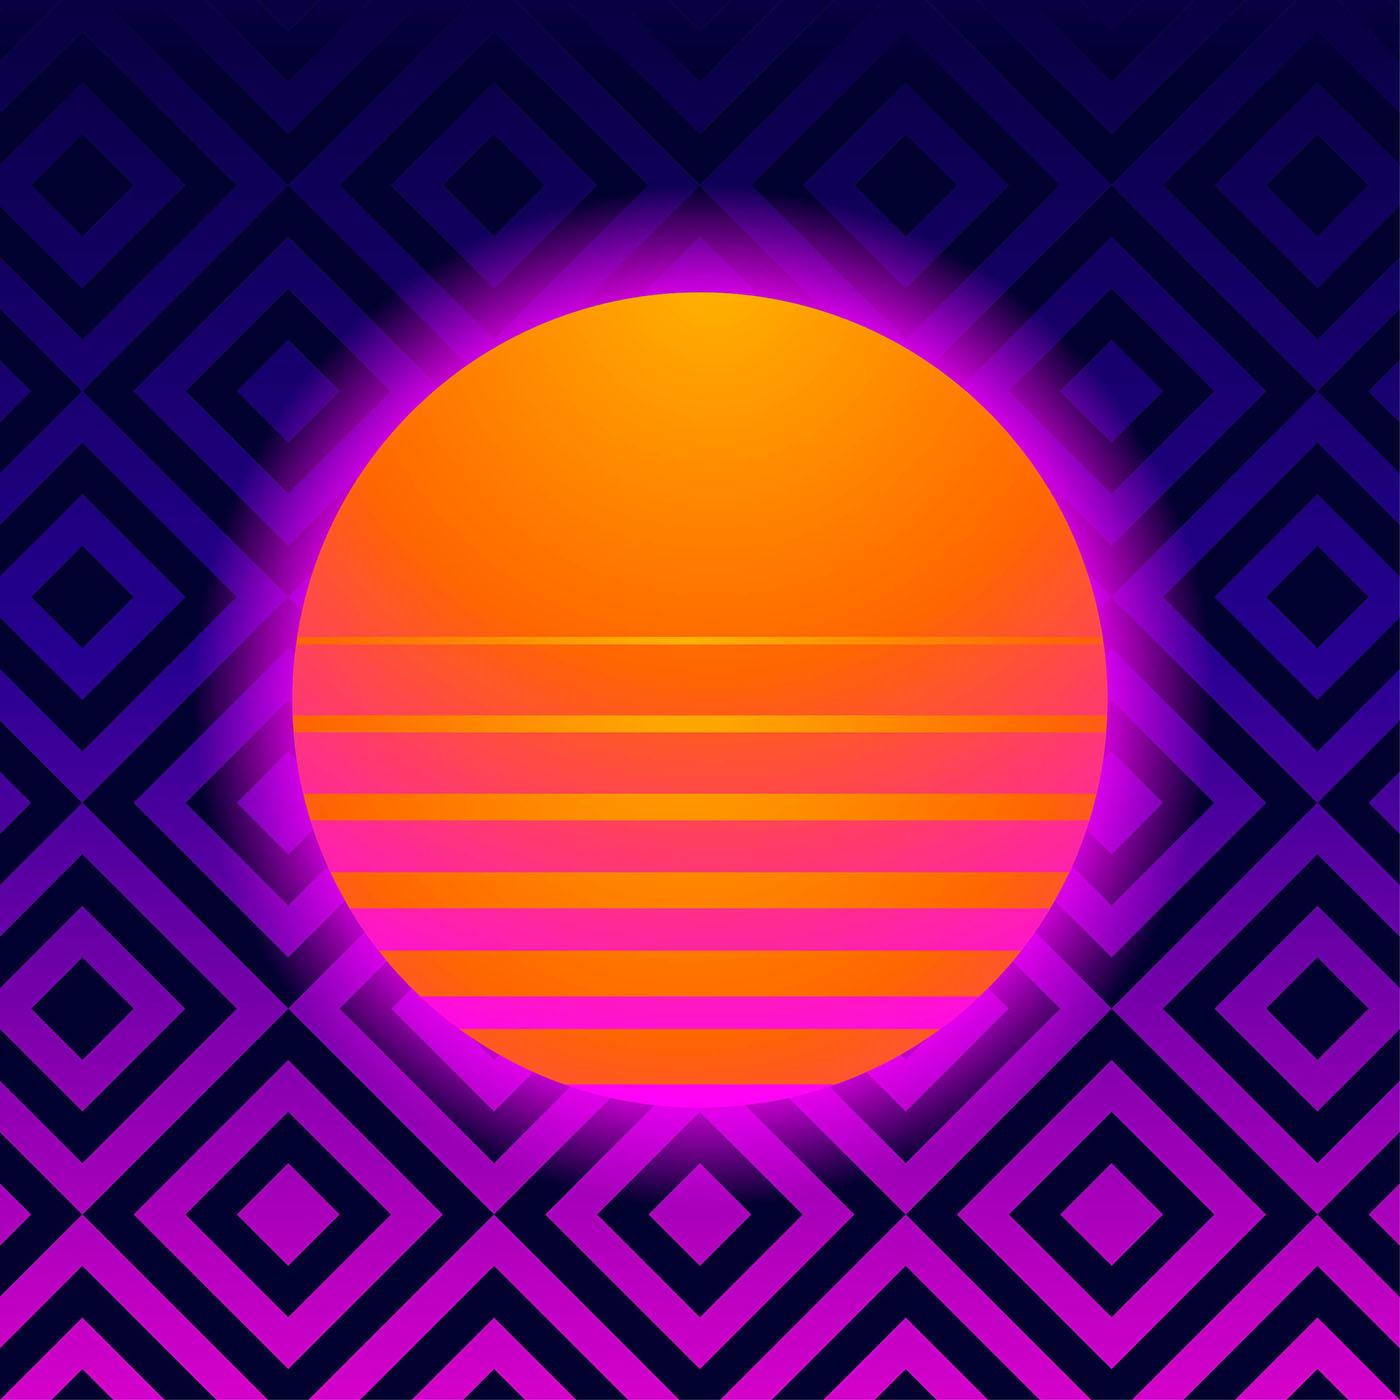 Retro Background Geometric With Vaporwave Sun Download Free